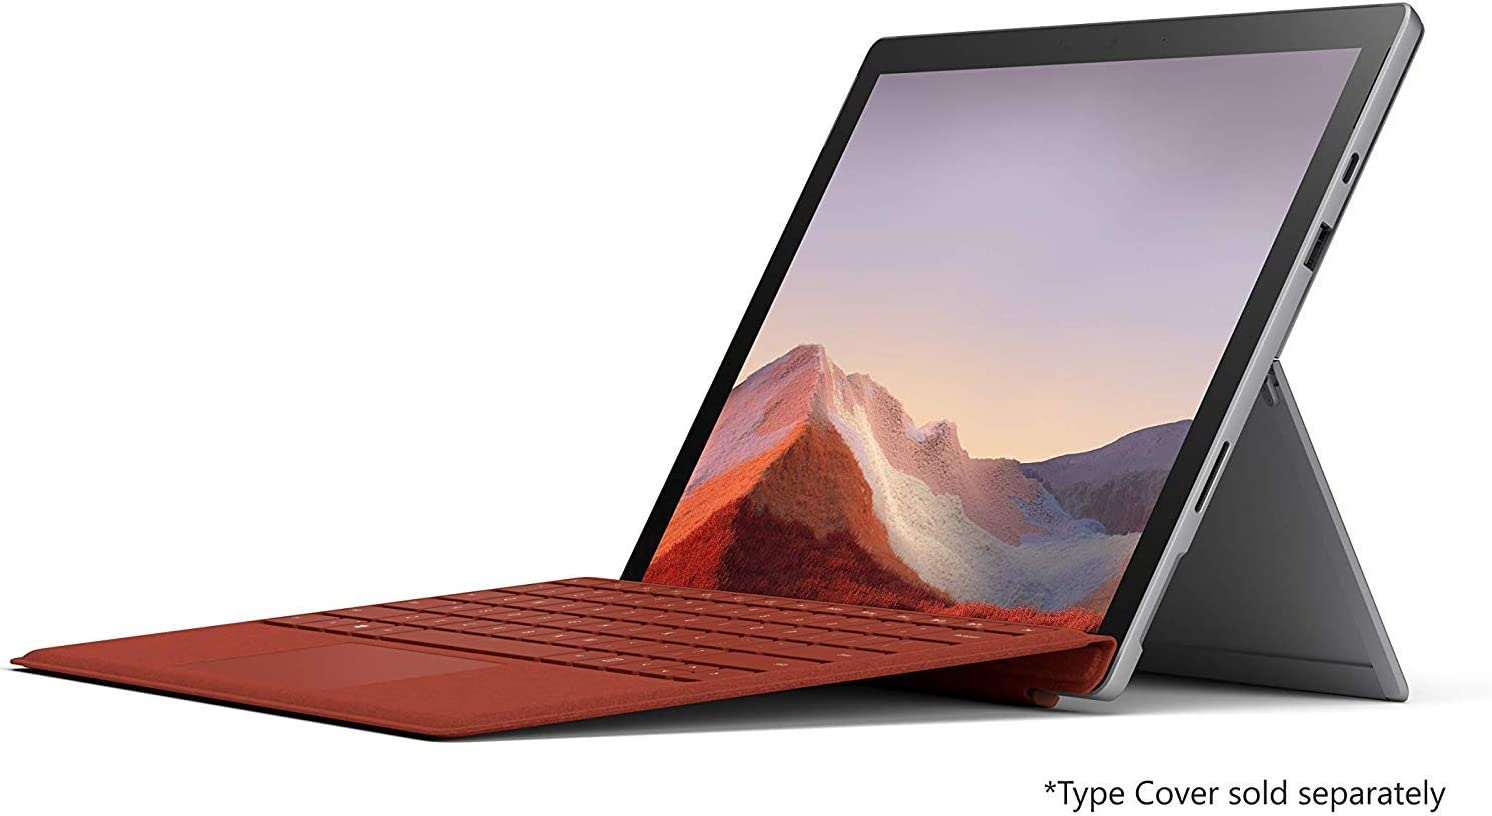 Microsoft Surface Pro 7 128GB i5 8GB RAM with Windows 10 Pro (Wi-Fi, Quad-Core i5-1035G4, Newest Version) Platinum PVQ-00001